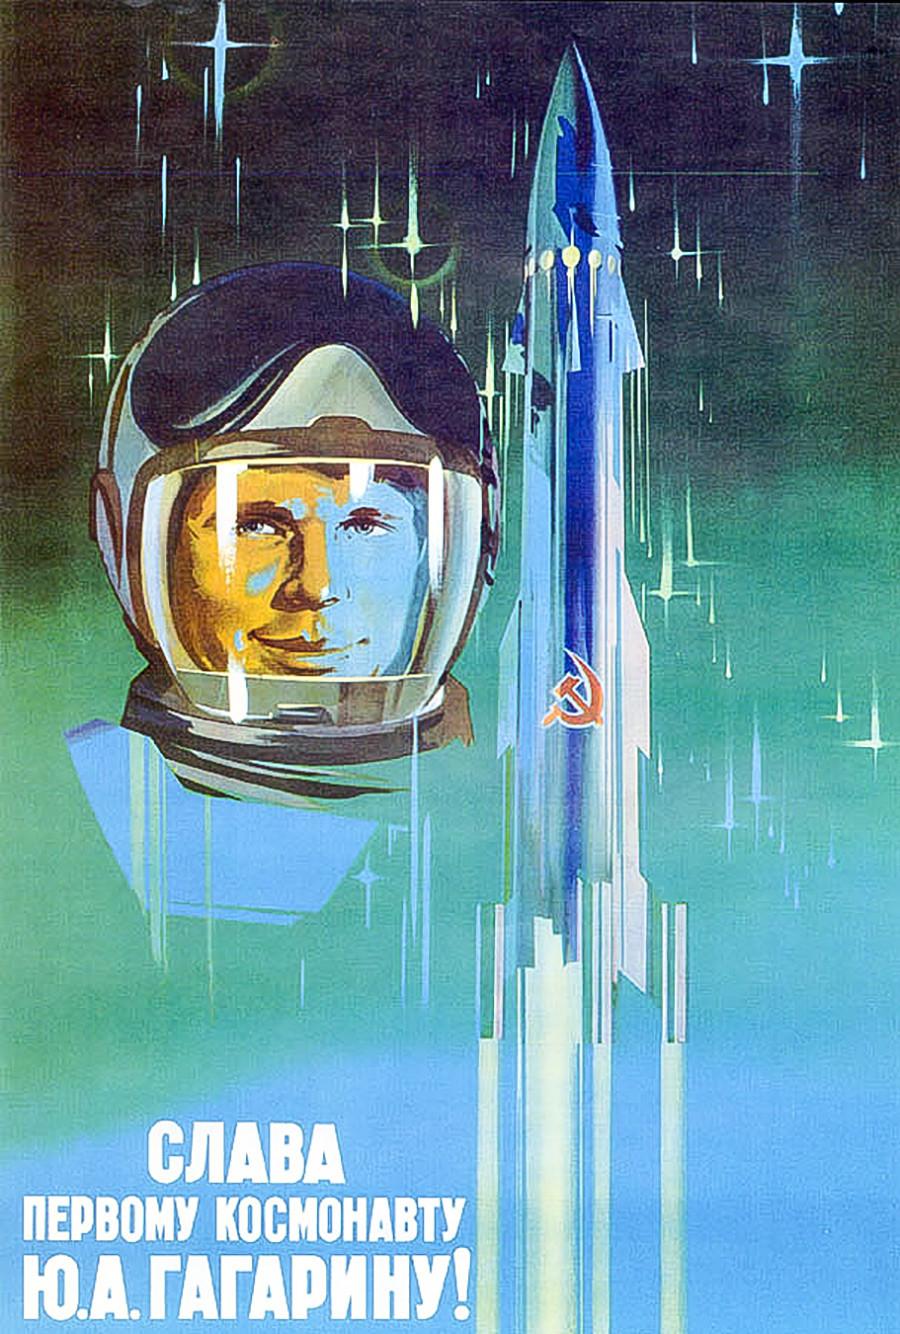 «Gloire au premier cosmonaute Iouri Gagarine!»